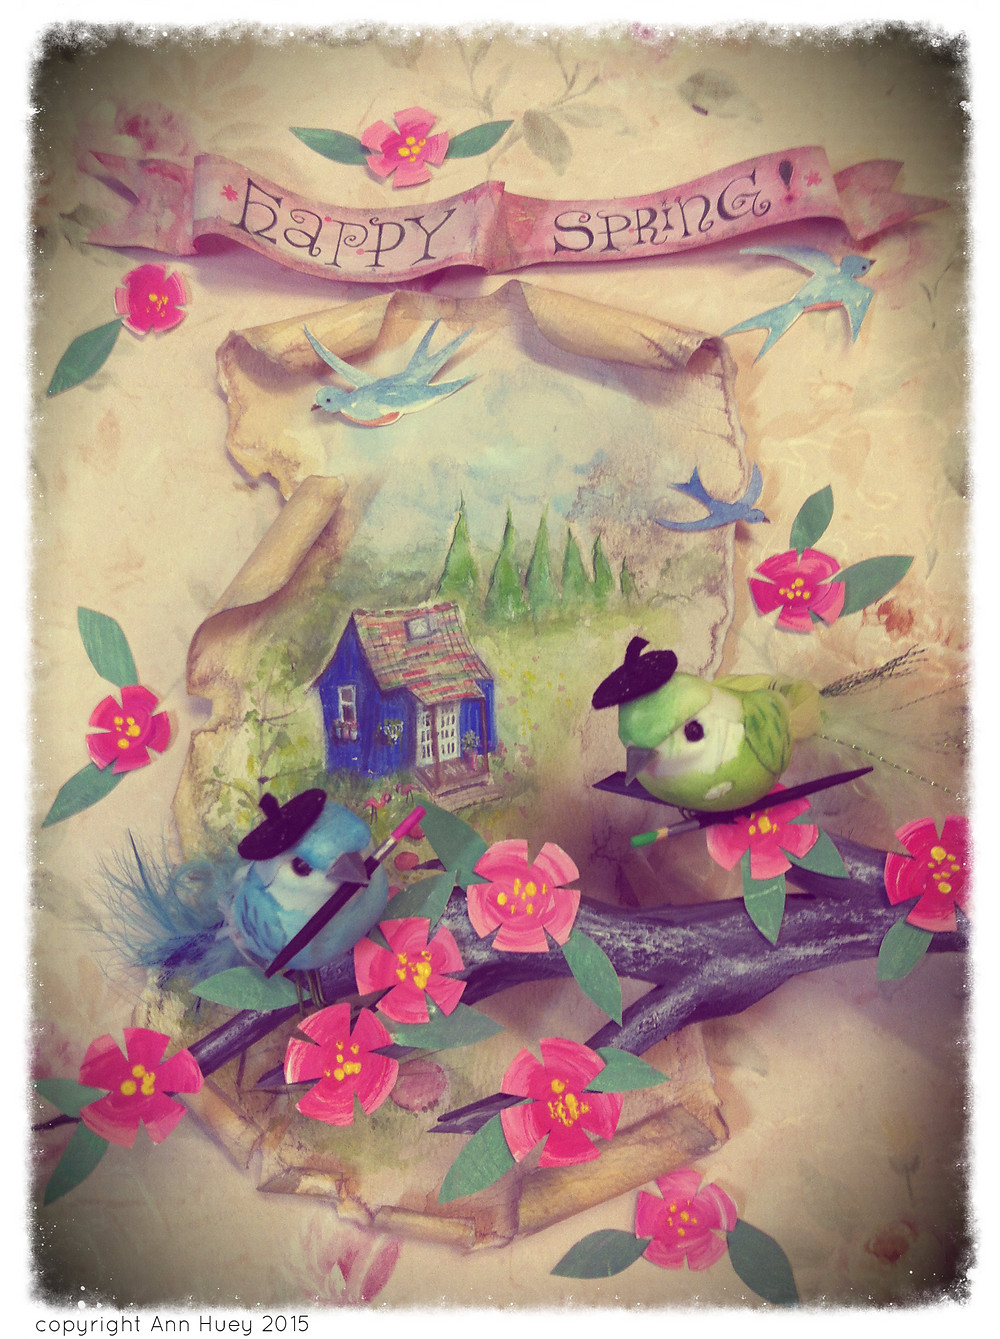 Happy Spring by Ann Huey